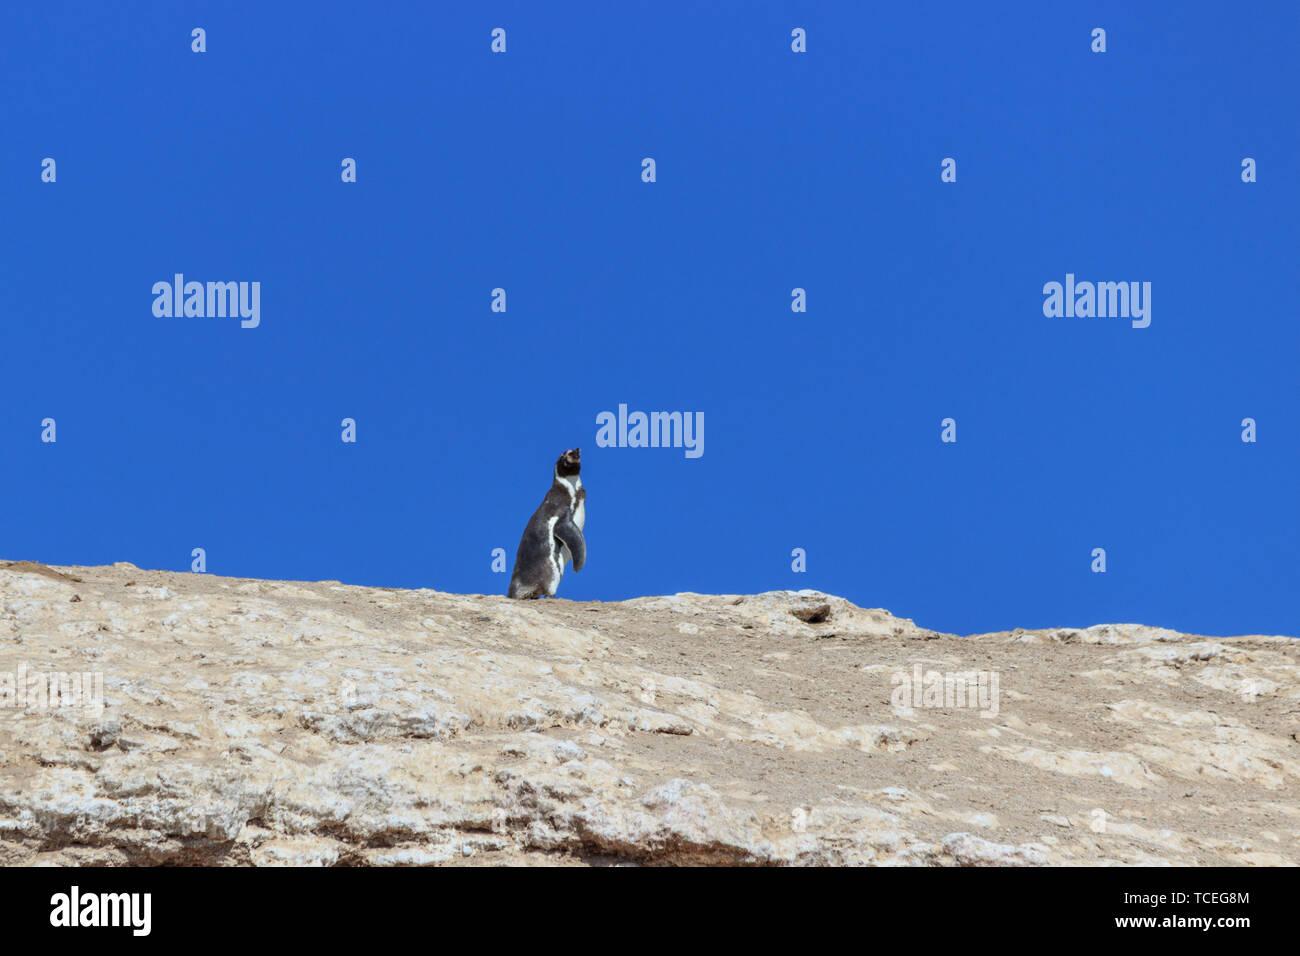 solitary Humboldt Penguin on the islas ballestas, peru - Stock Image